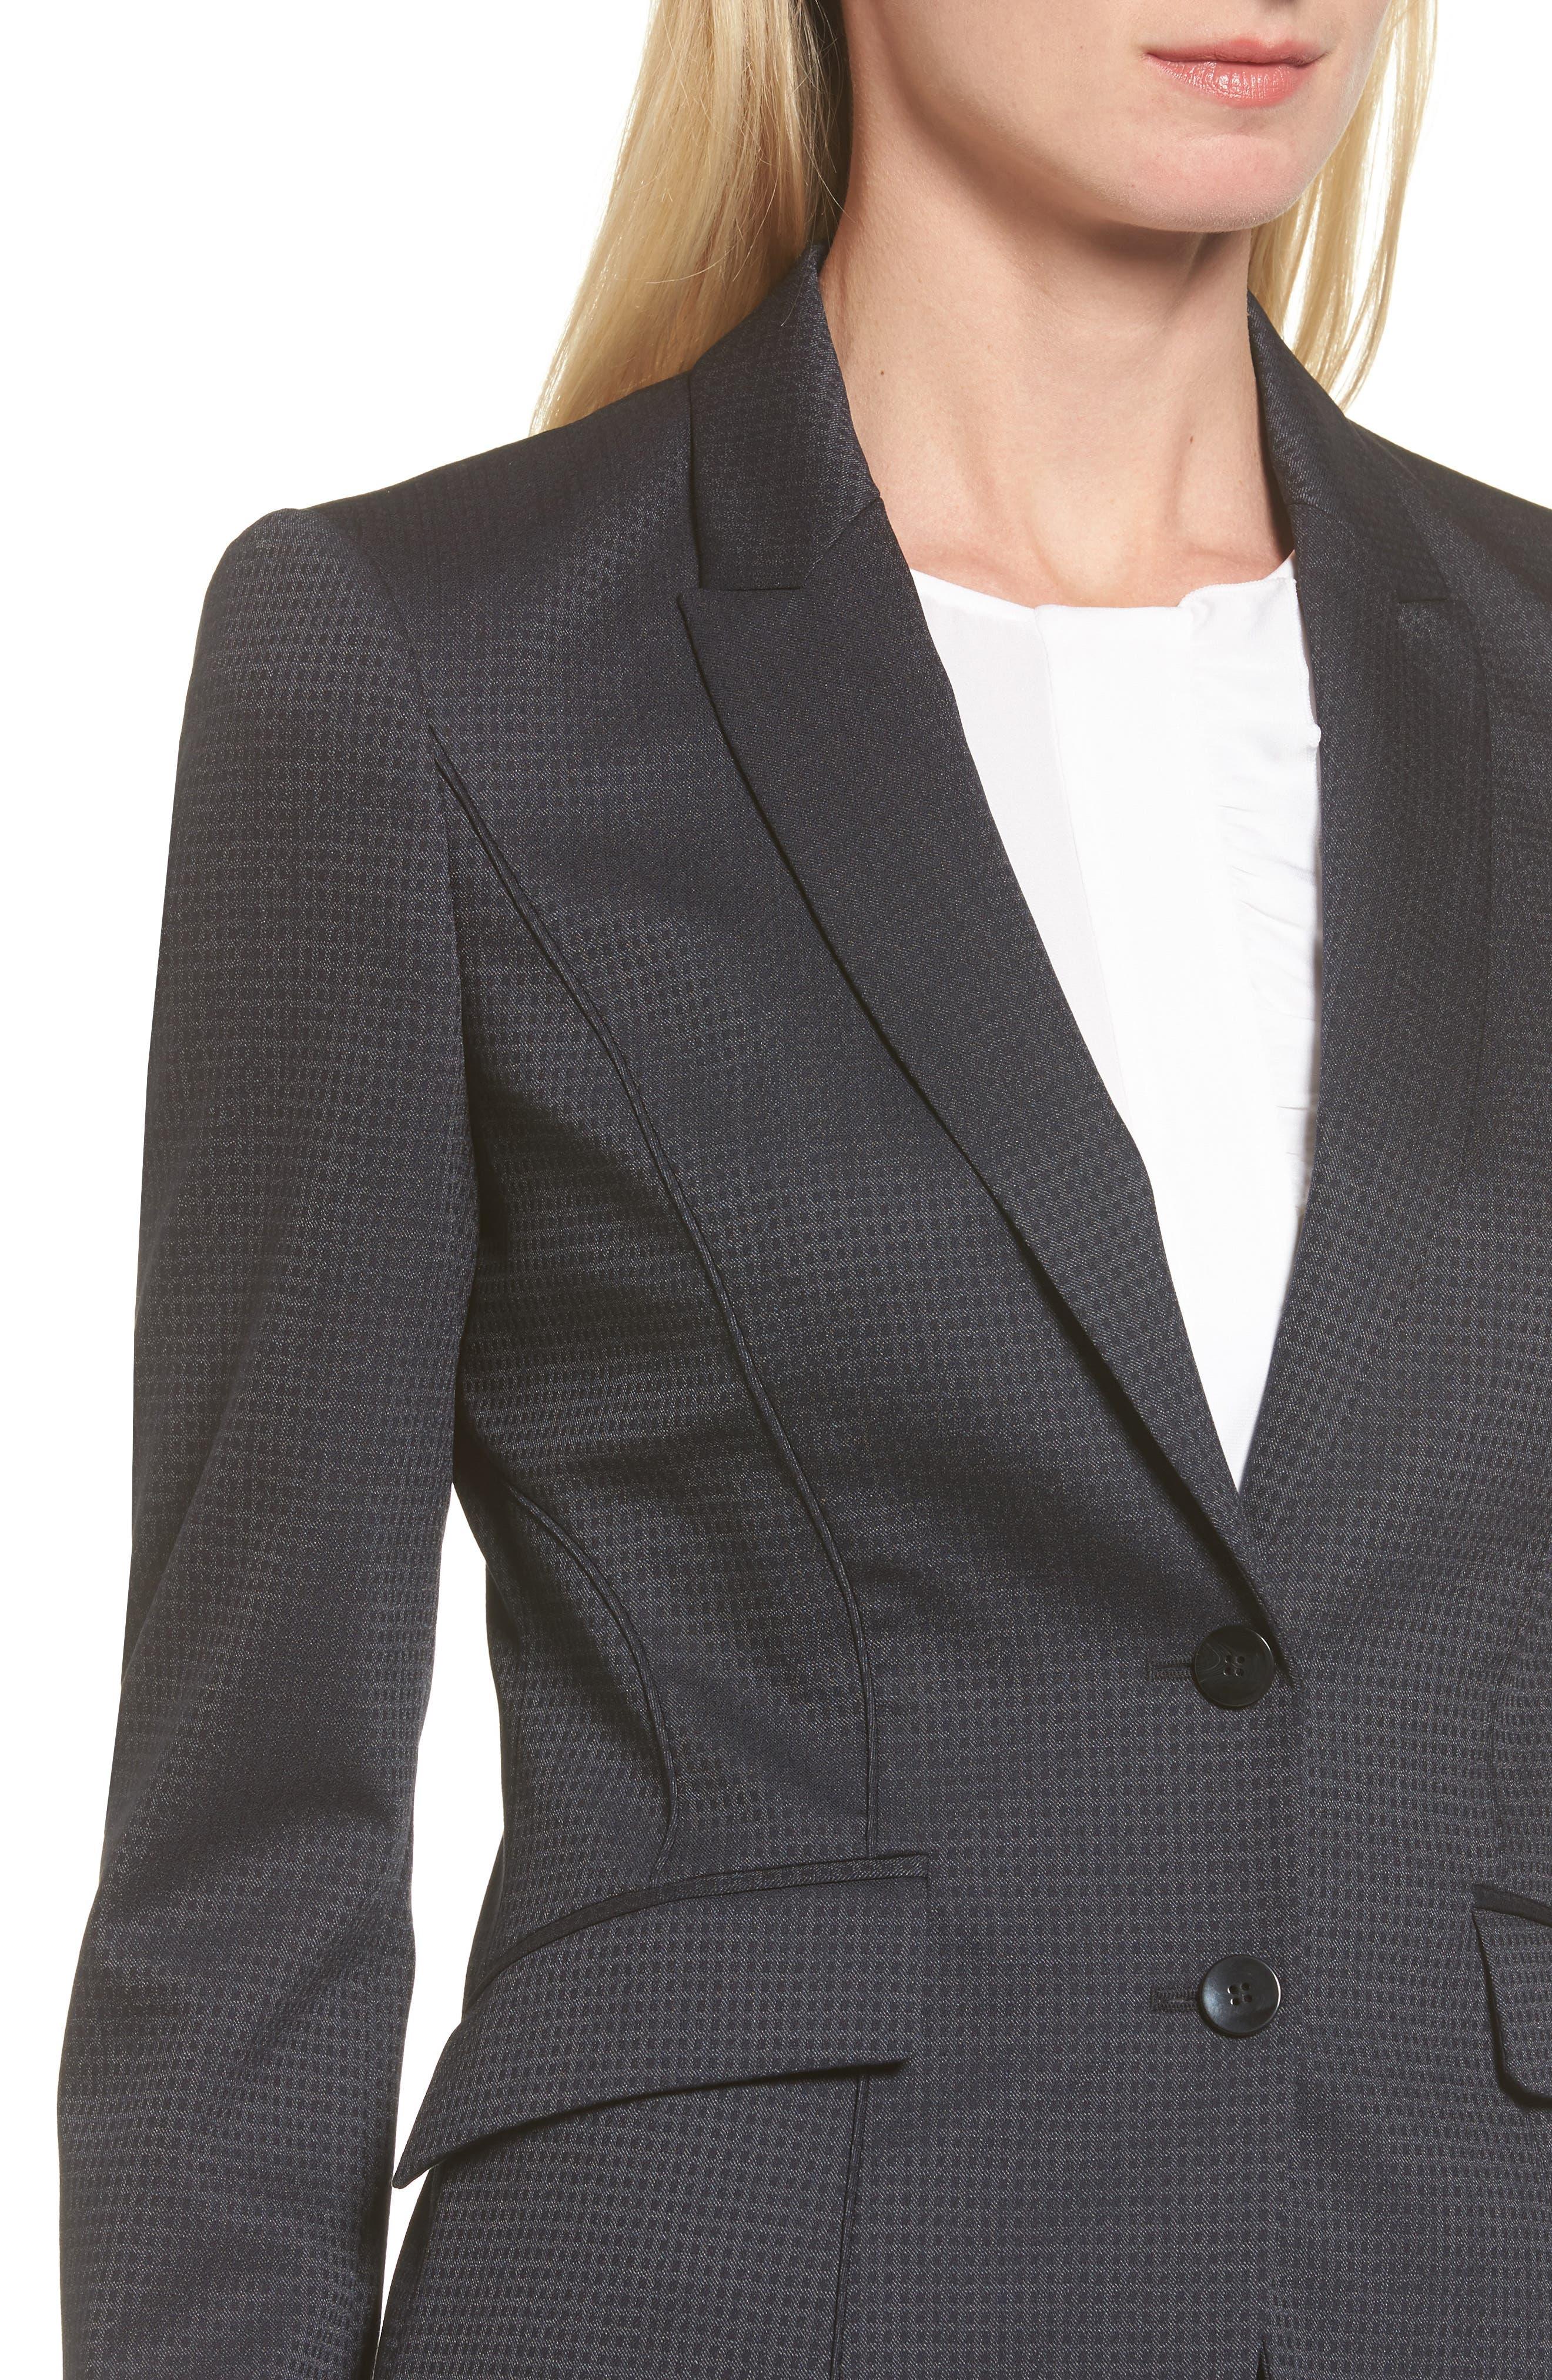 Jukani Check Wool Blend Suit Jacket,                             Alternate thumbnail 8, color,